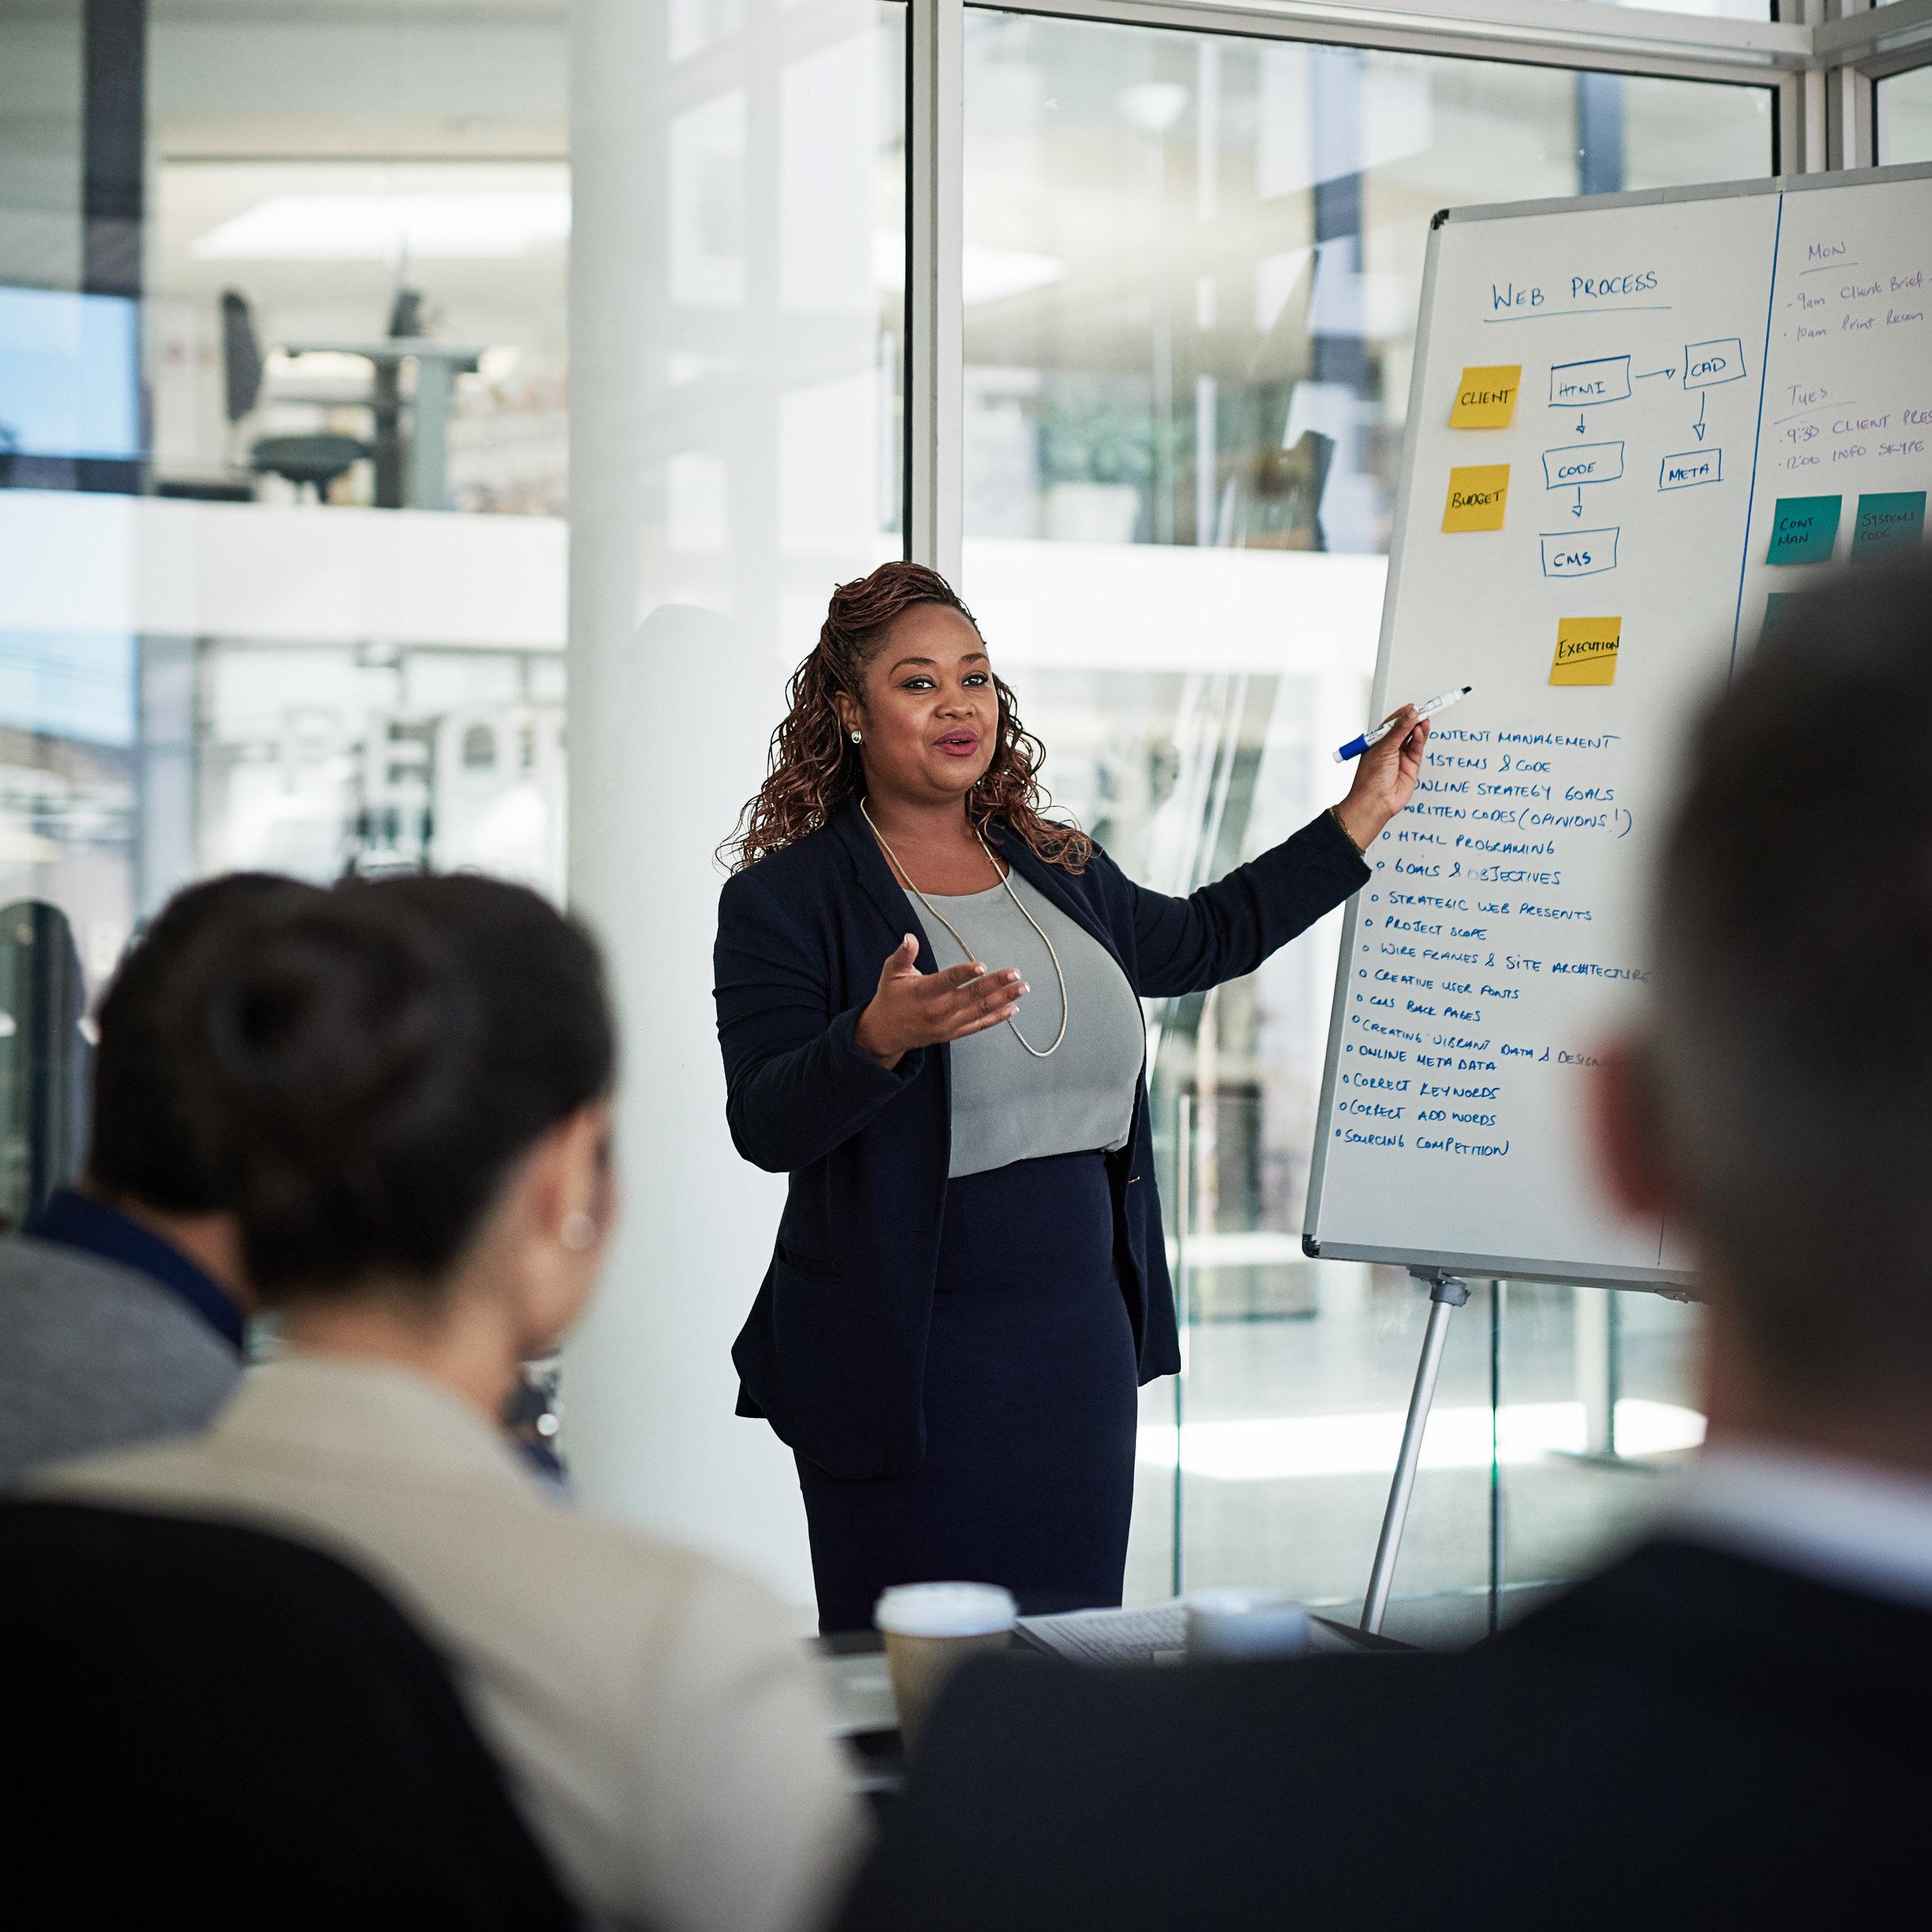 Executive education seminars centered on leadership, business and people skills.